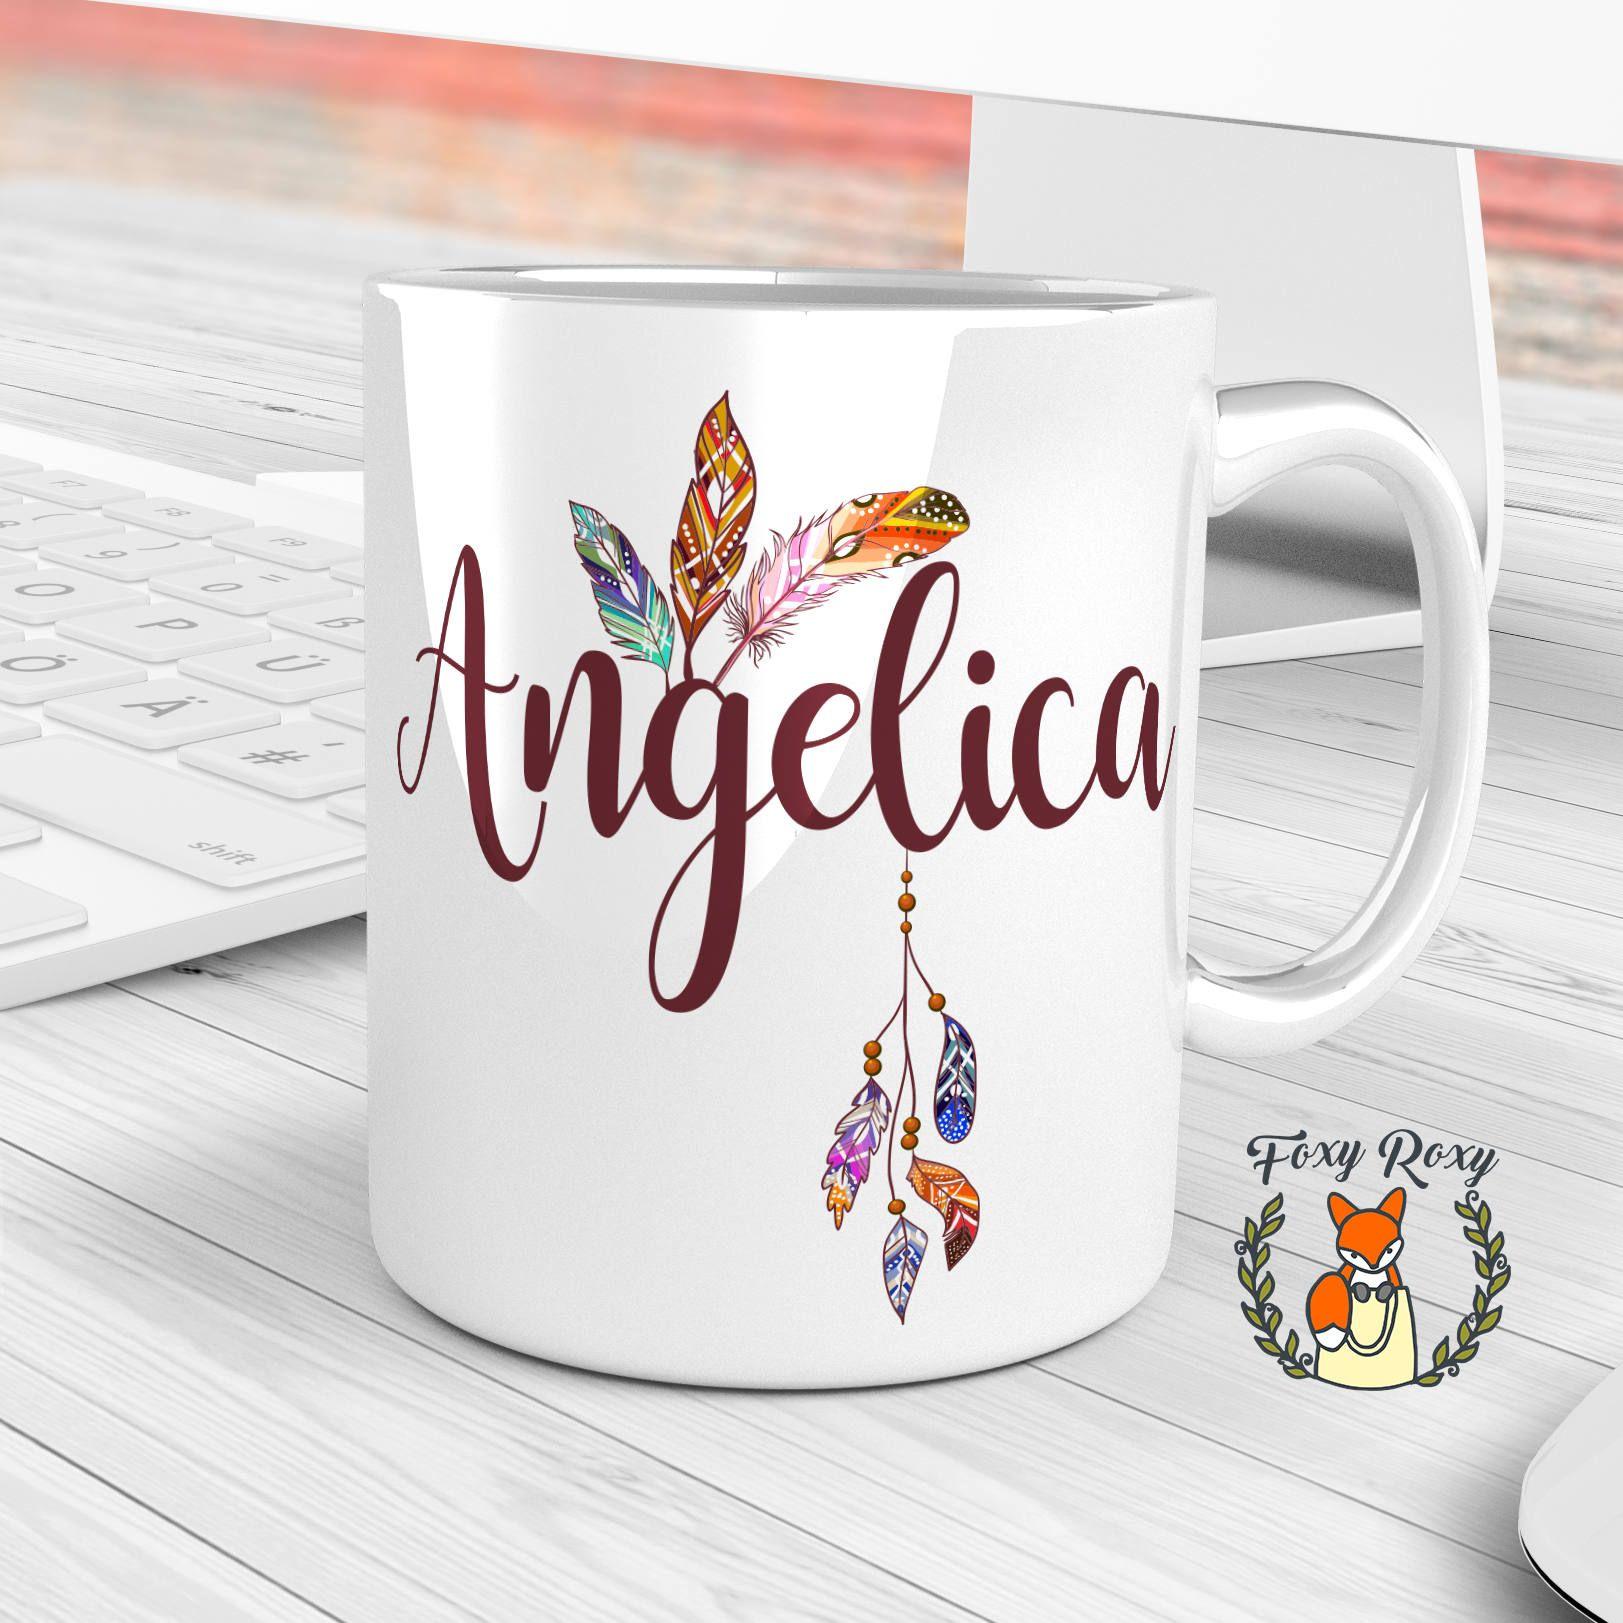 Personalized Name Feathers Mug Custom Gift For Bridesmaid